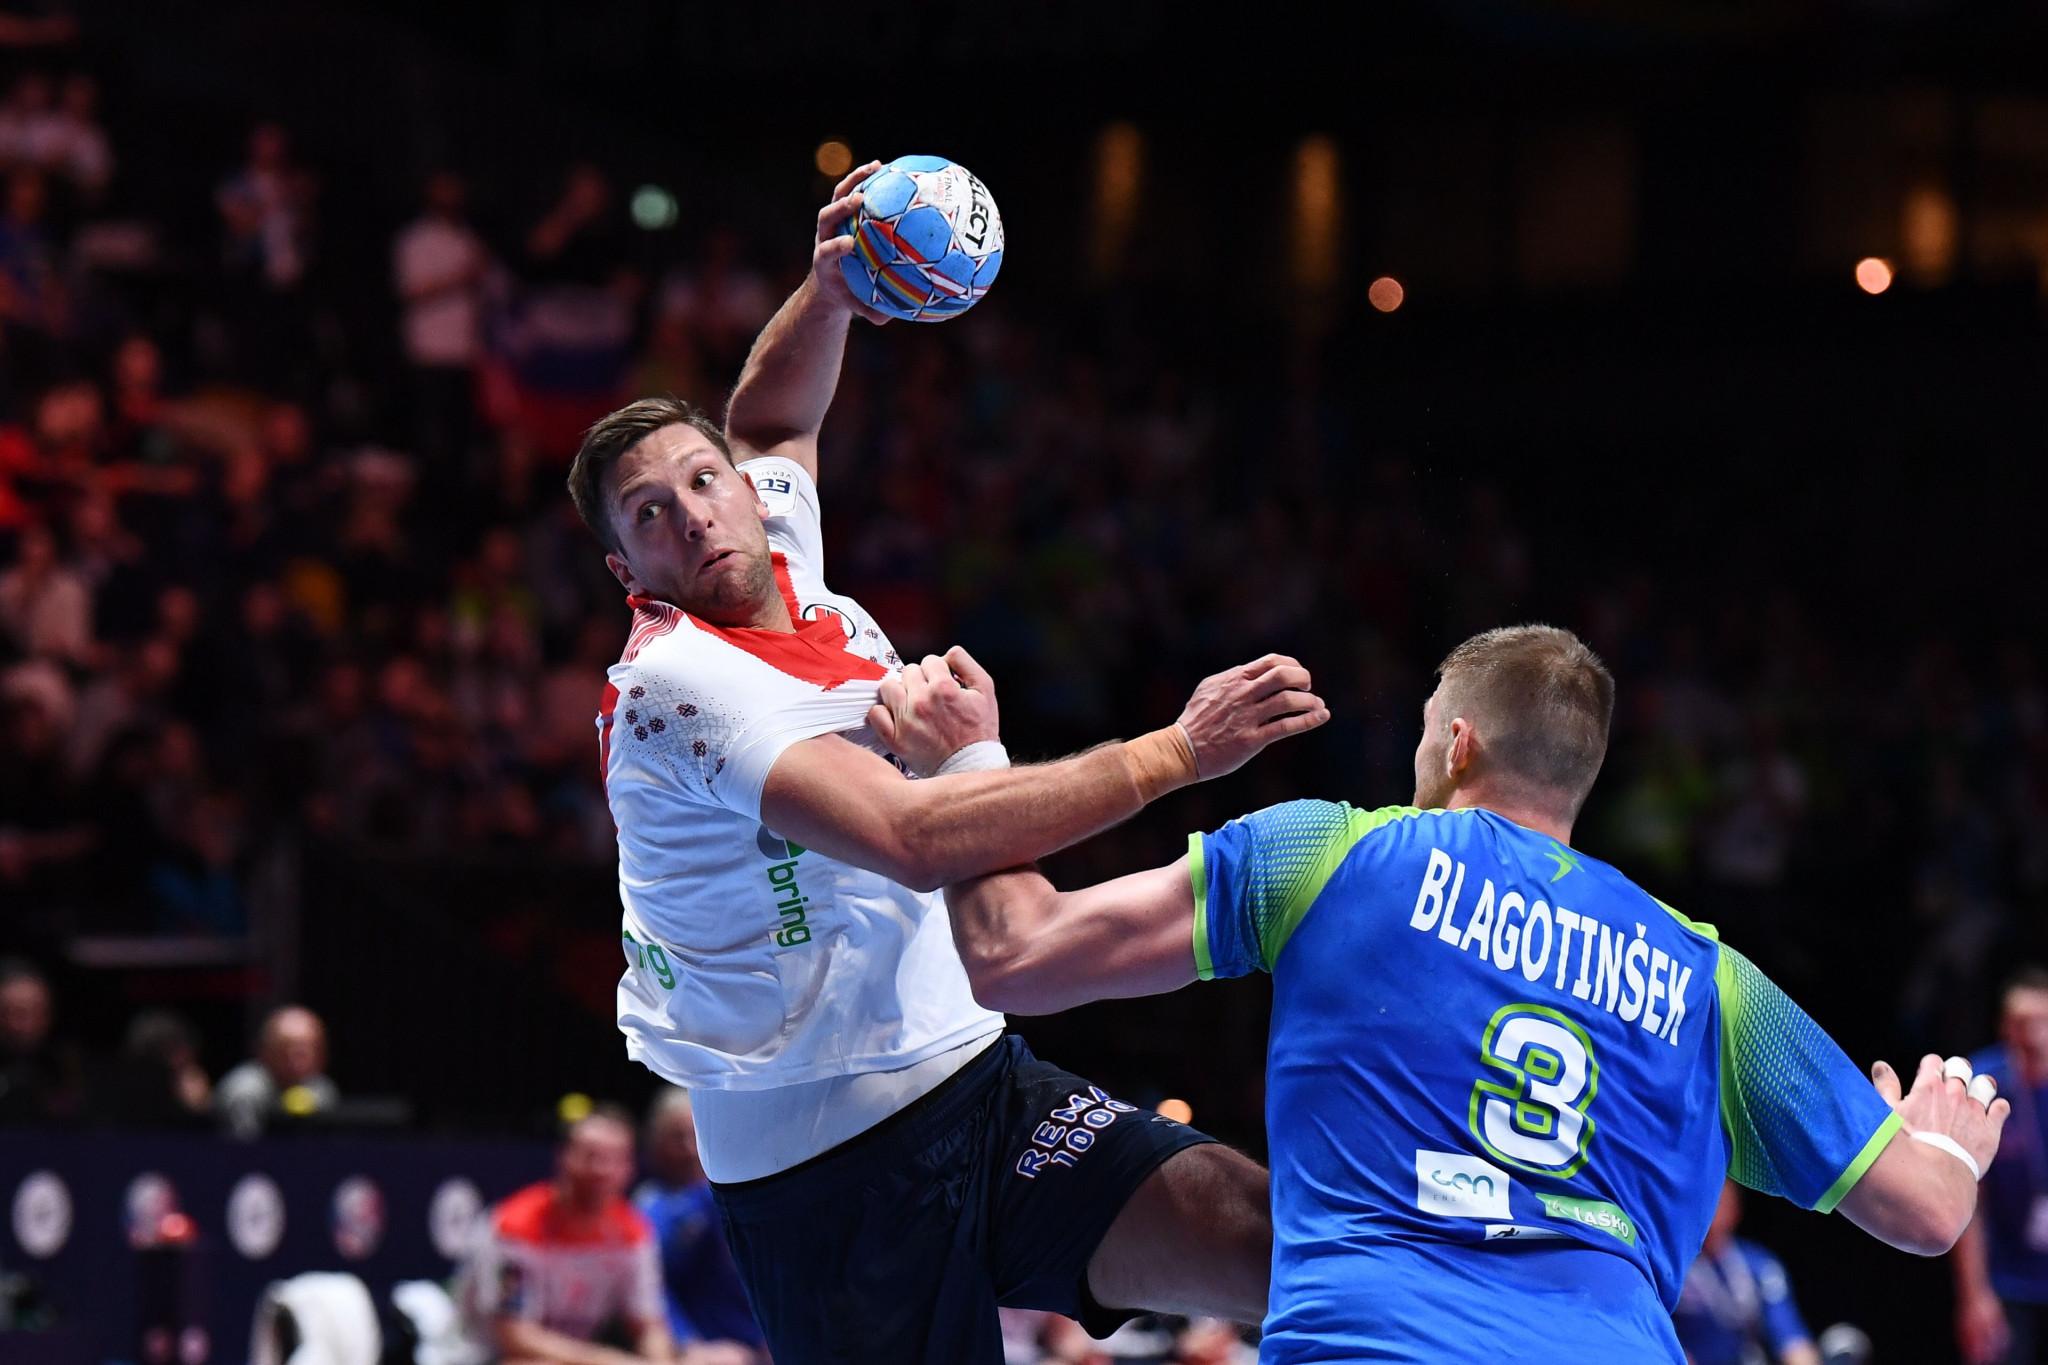 Norway win first medal in European Men's Handball Championship history